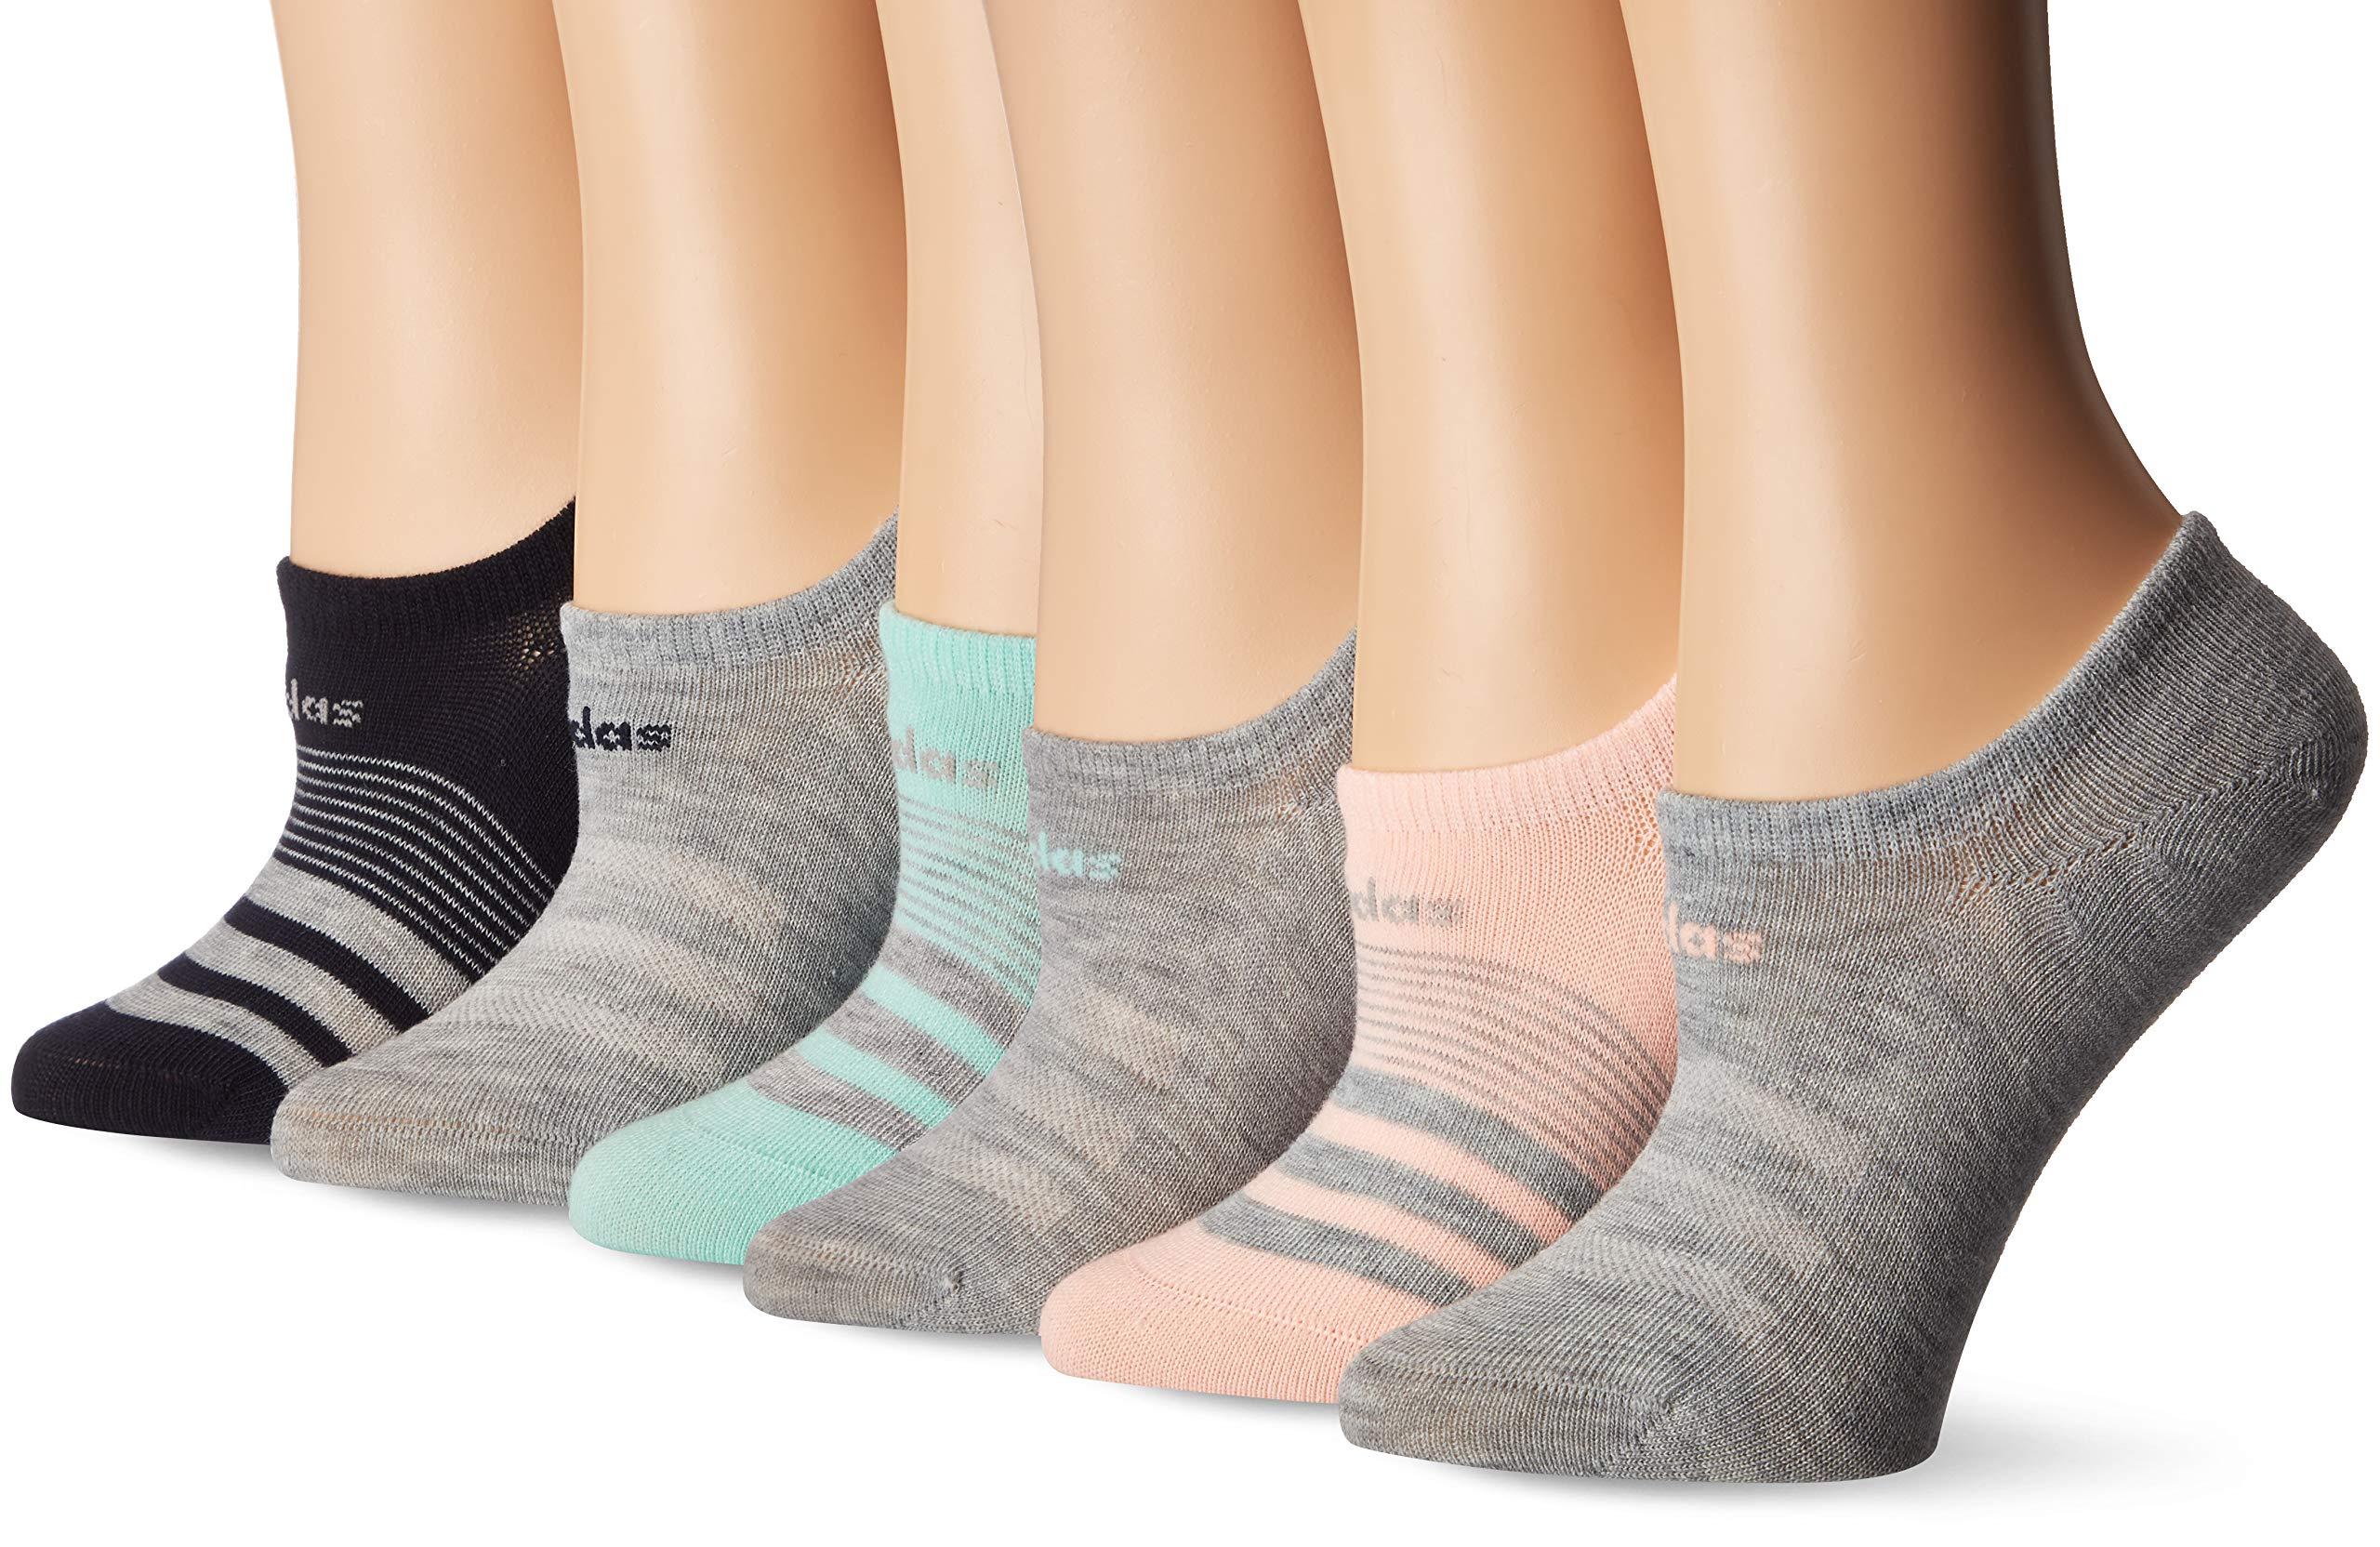 adidas Women's Superlite Super No Show Socks (6-Pack), Clear Orange/Light Heather Grey/Clear Mint/Legend, 5-10